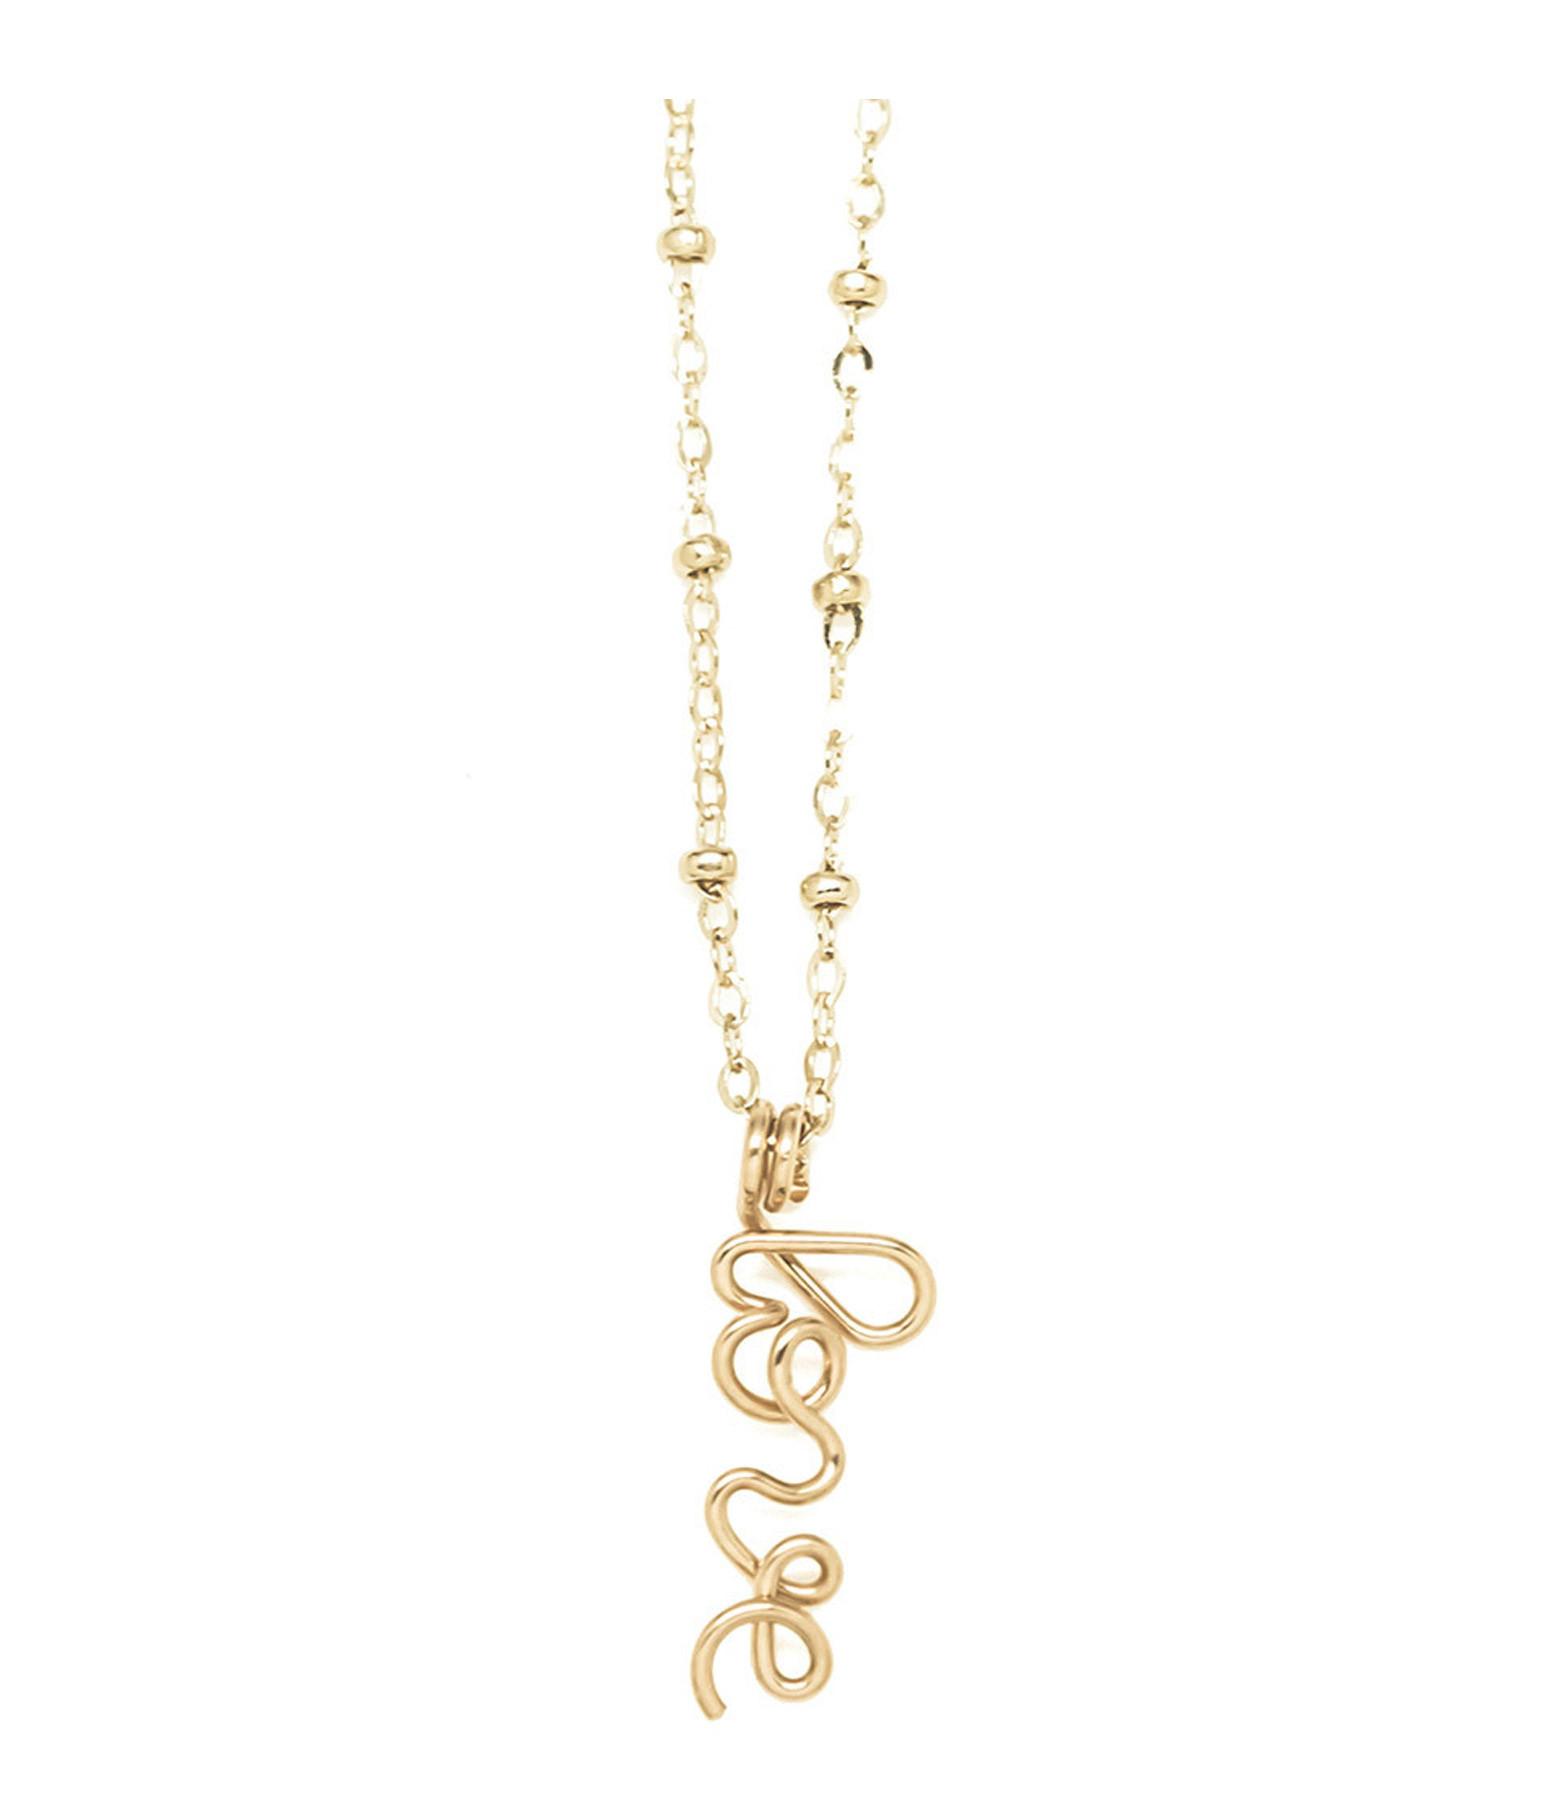 ATELIER PAULIN - Collier Pendentif Original Love Gold Filled 14K